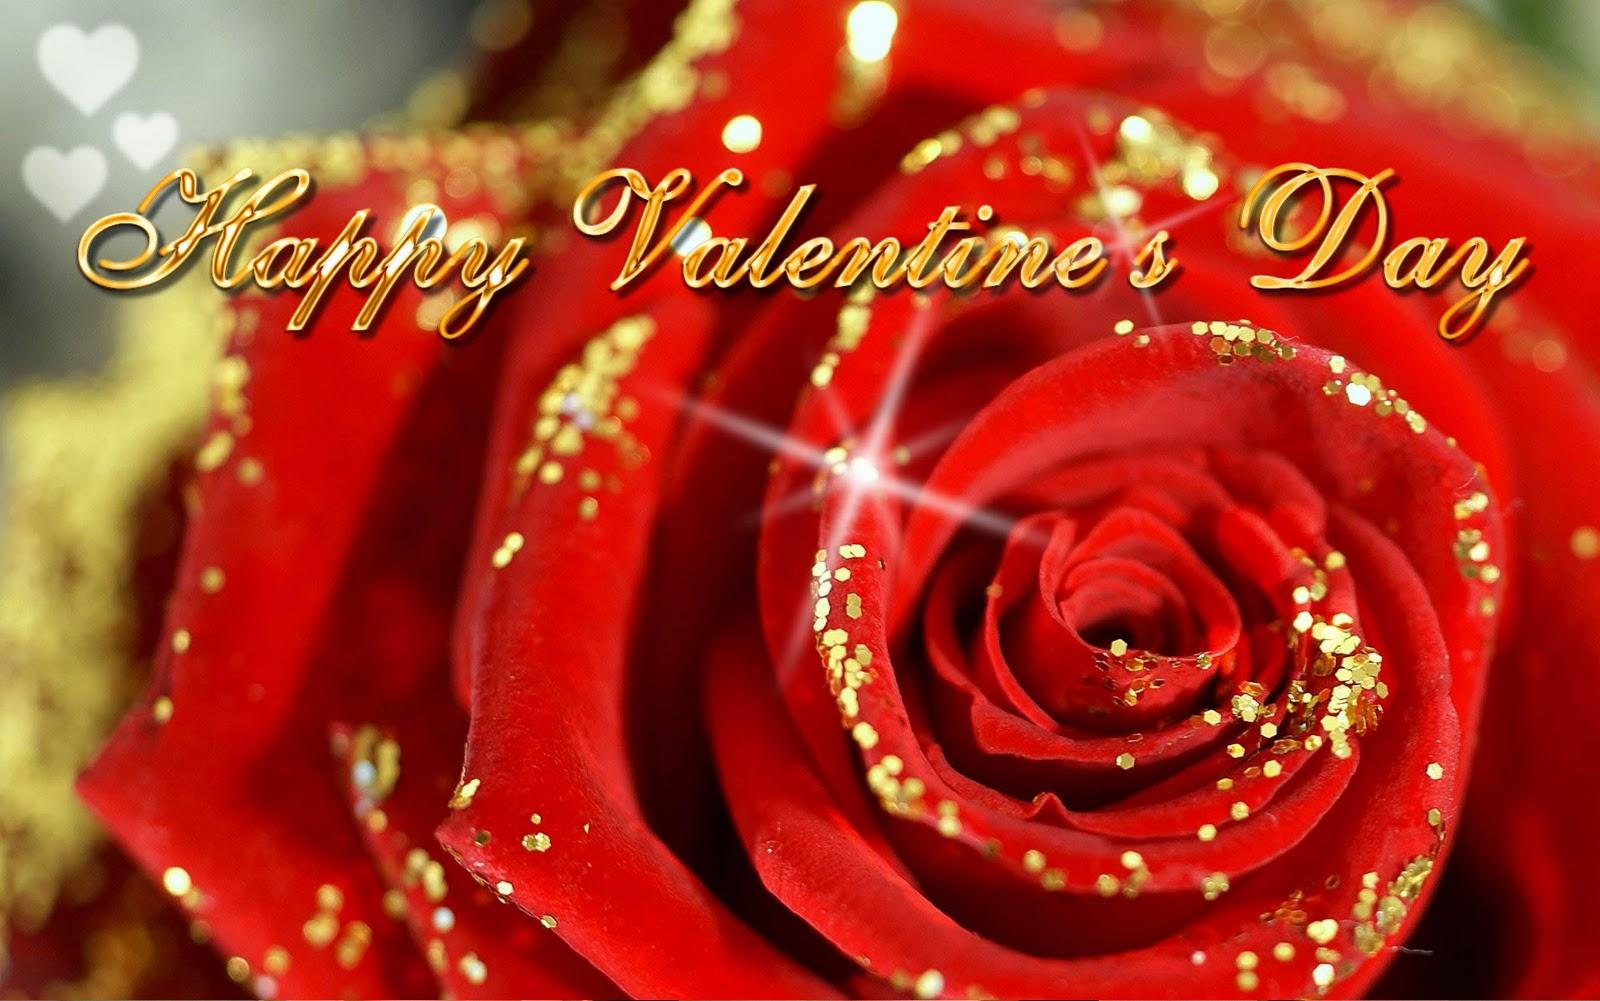 http://1.bp.blogspot.com/-x5R6vBKvwLA/TrREYUmvruI/AAAAAAAABVE/Gn3mveeYeKI/s1600/happy-valentines-day-wallpaper-rose-golden-glitter.jpg